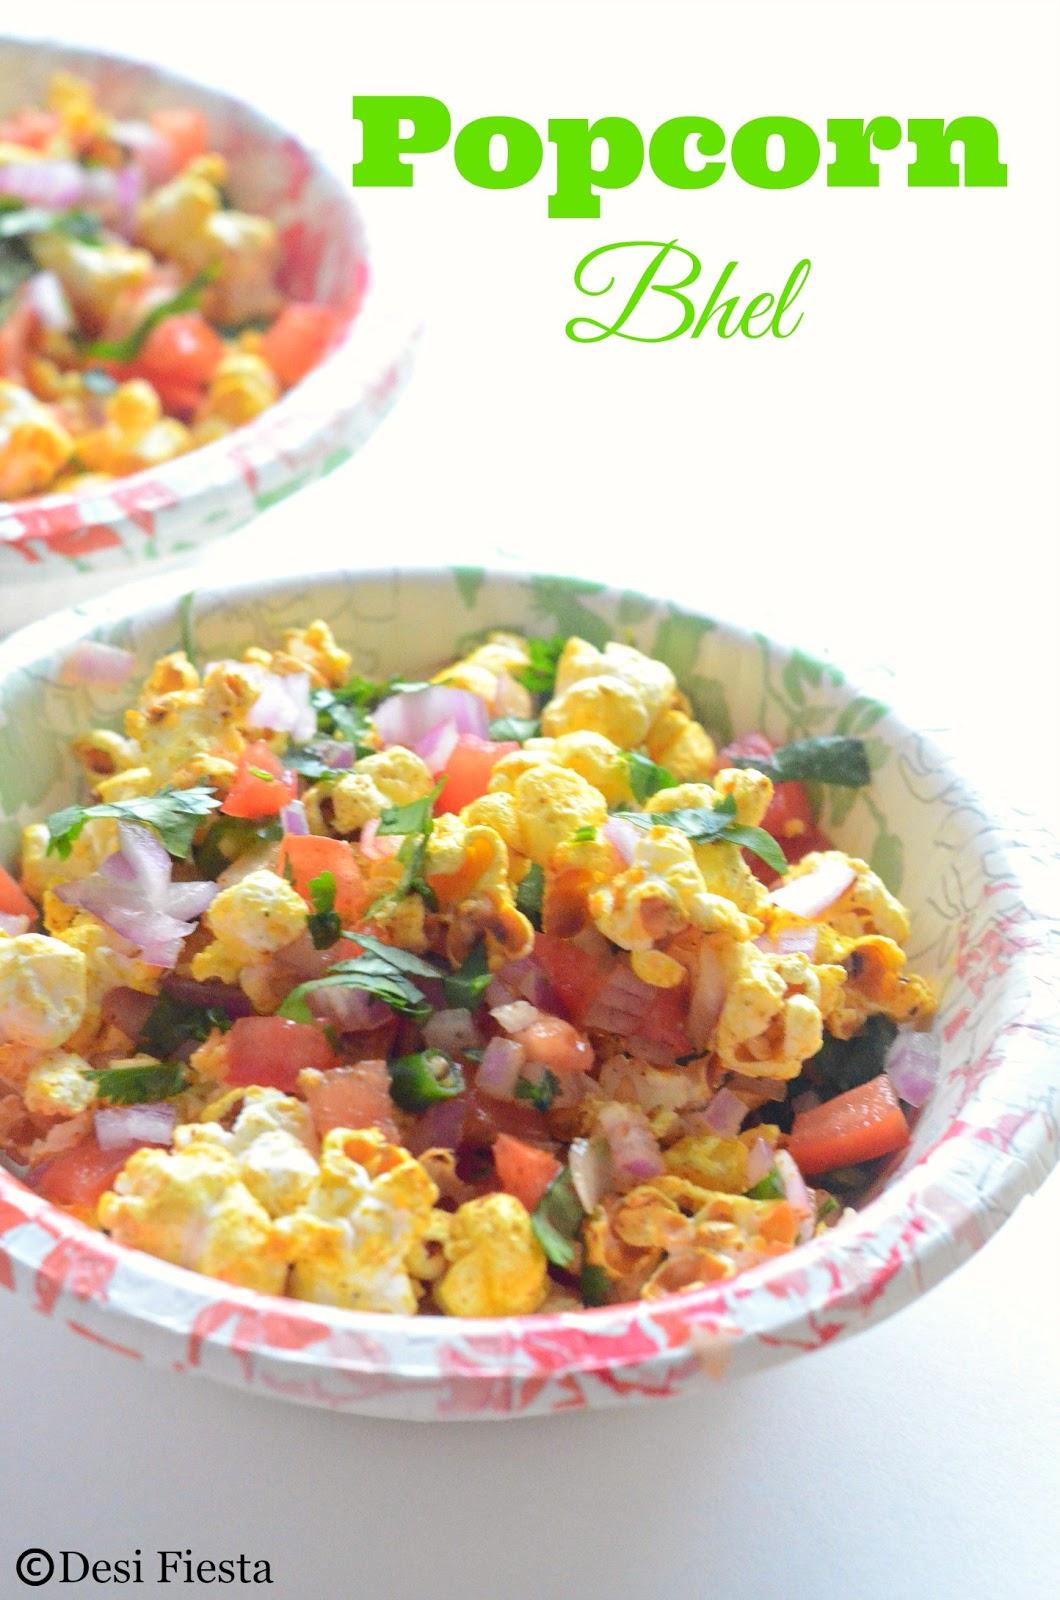 Popcorn chaat recipe